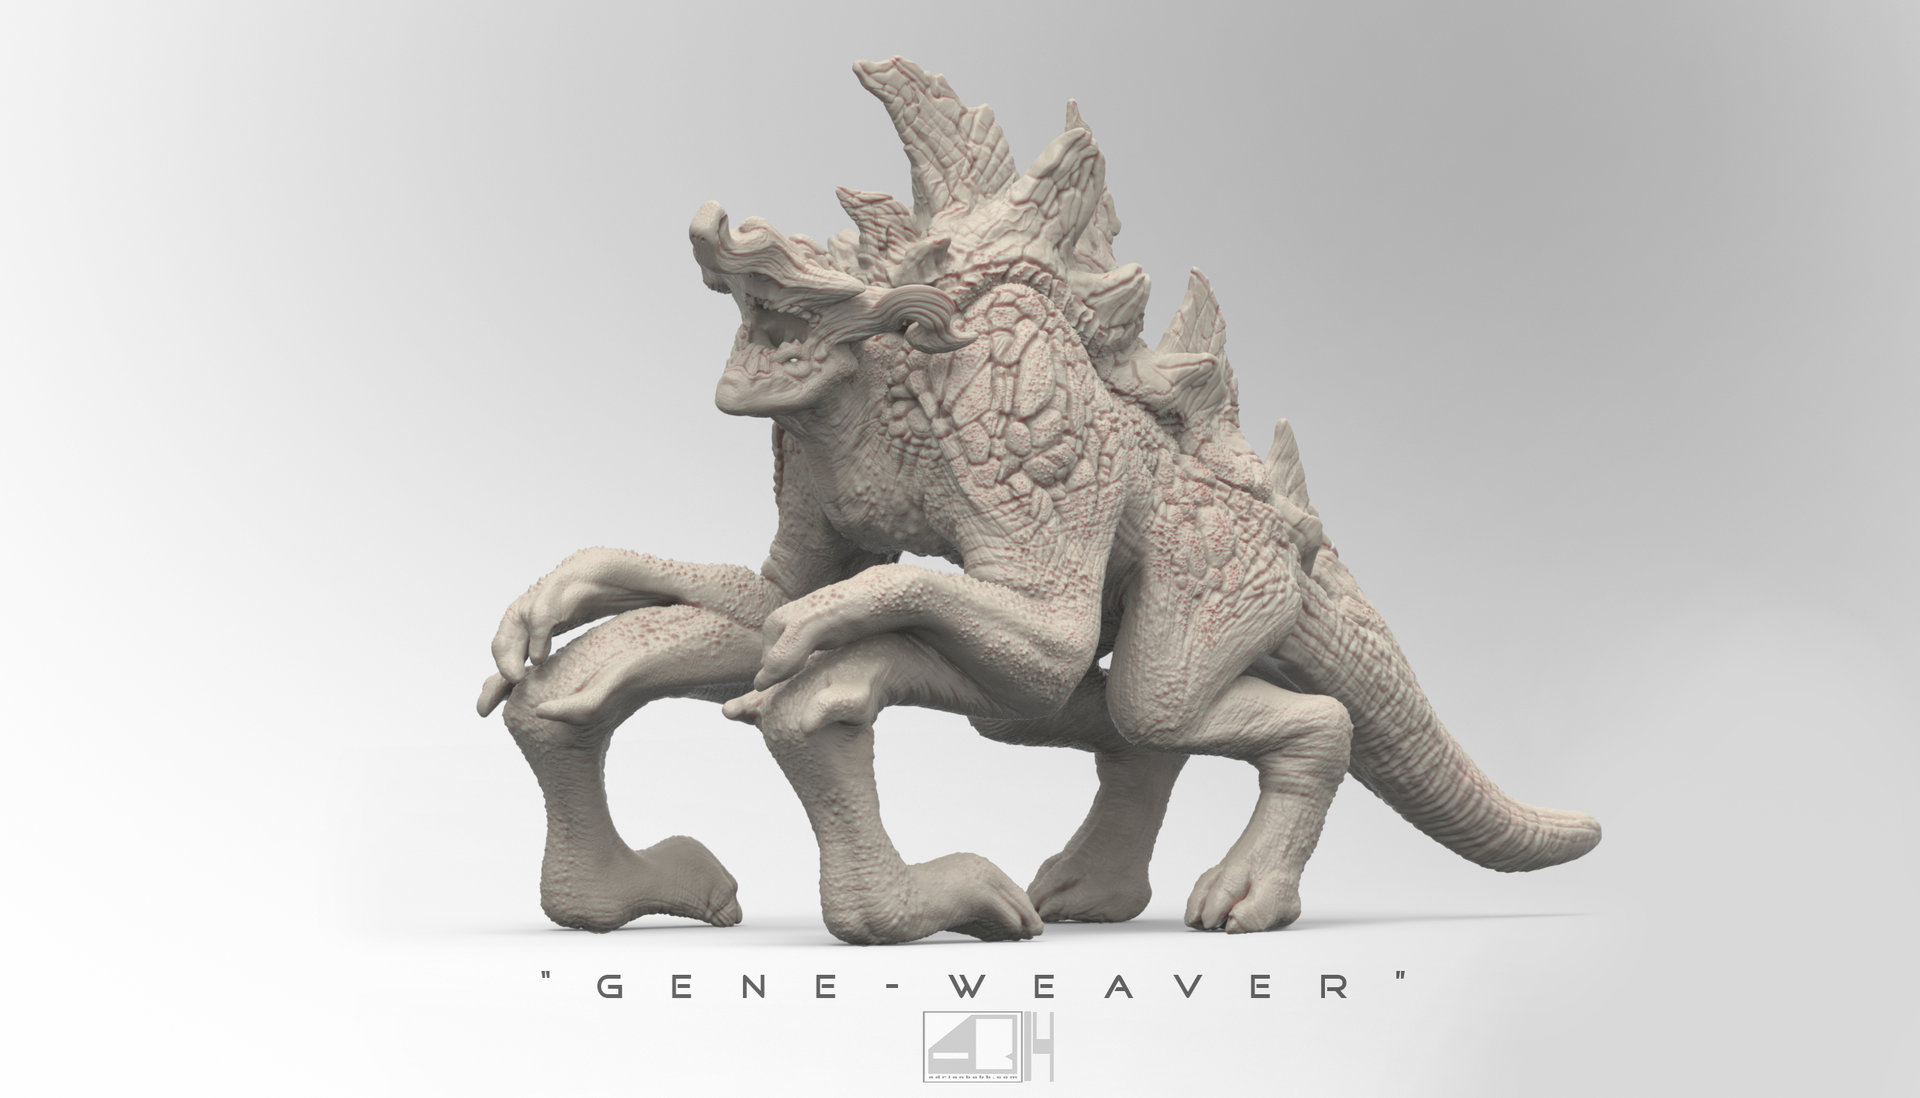 """Gene-Weaver Sculpt"""